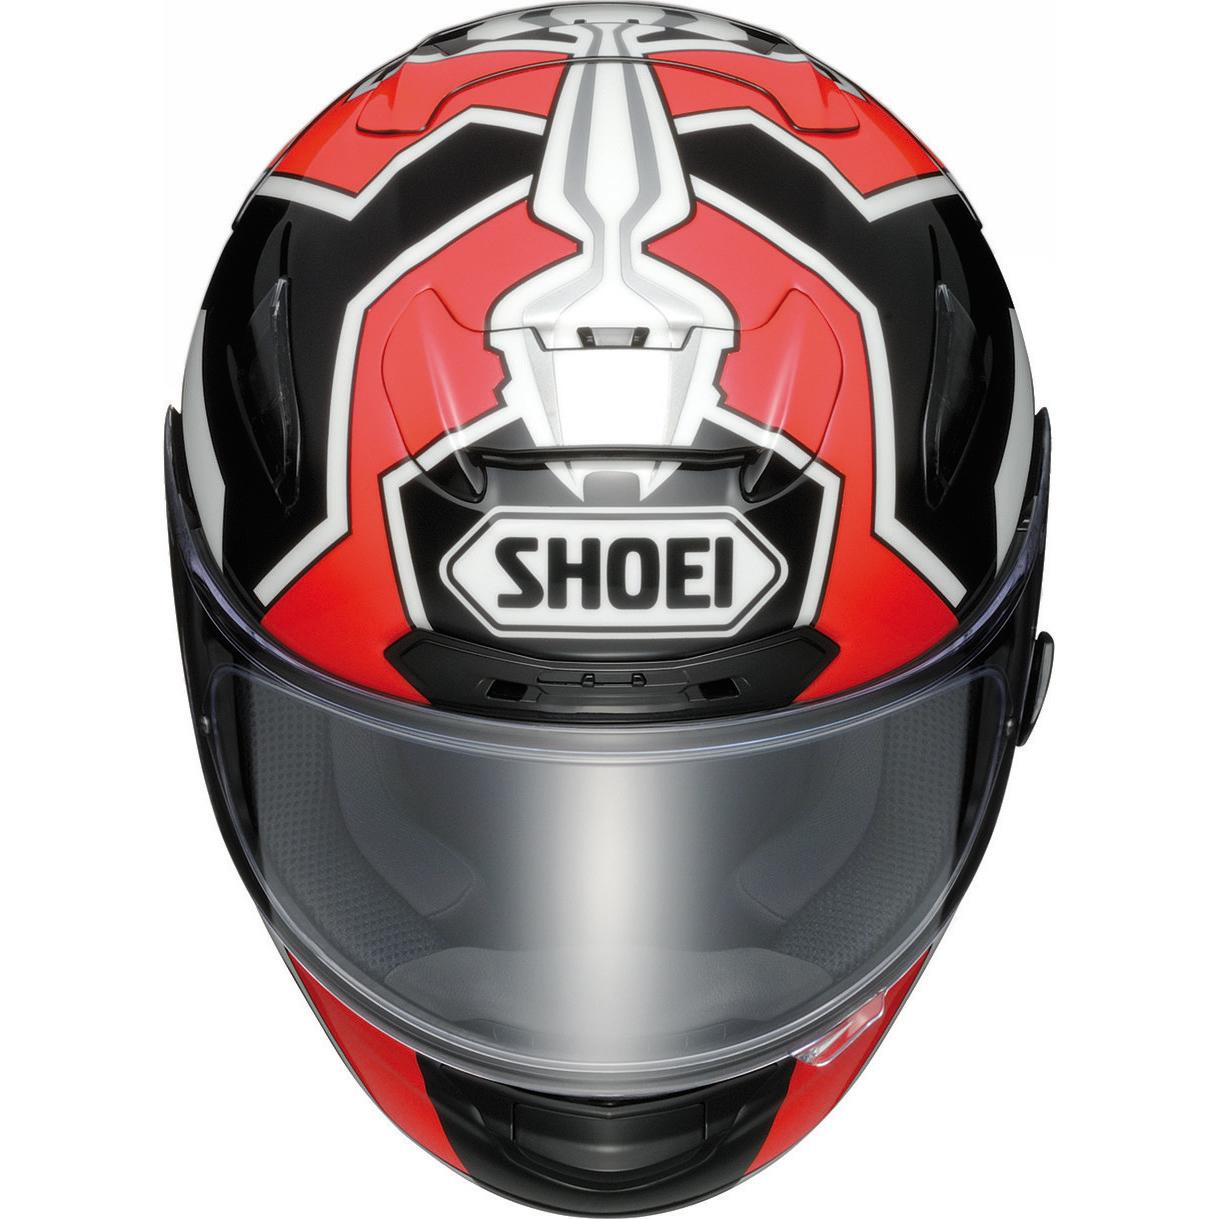 shoei x spirit 2 marquez 2 black white red motorcycle helmet tc 1 acu full face ebay. Black Bedroom Furniture Sets. Home Design Ideas